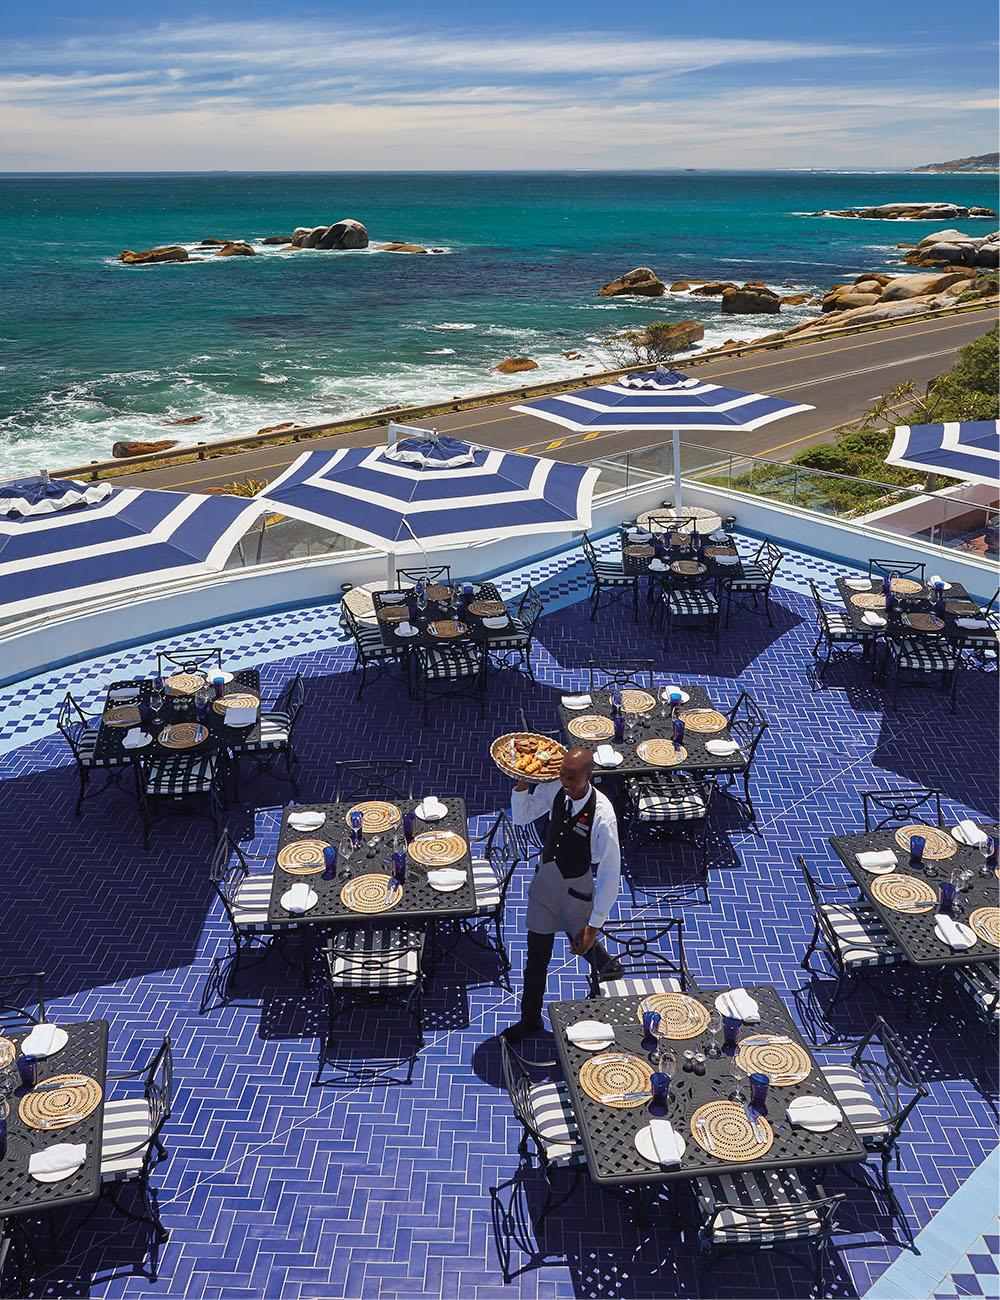 The terrace at Azure Restaurant